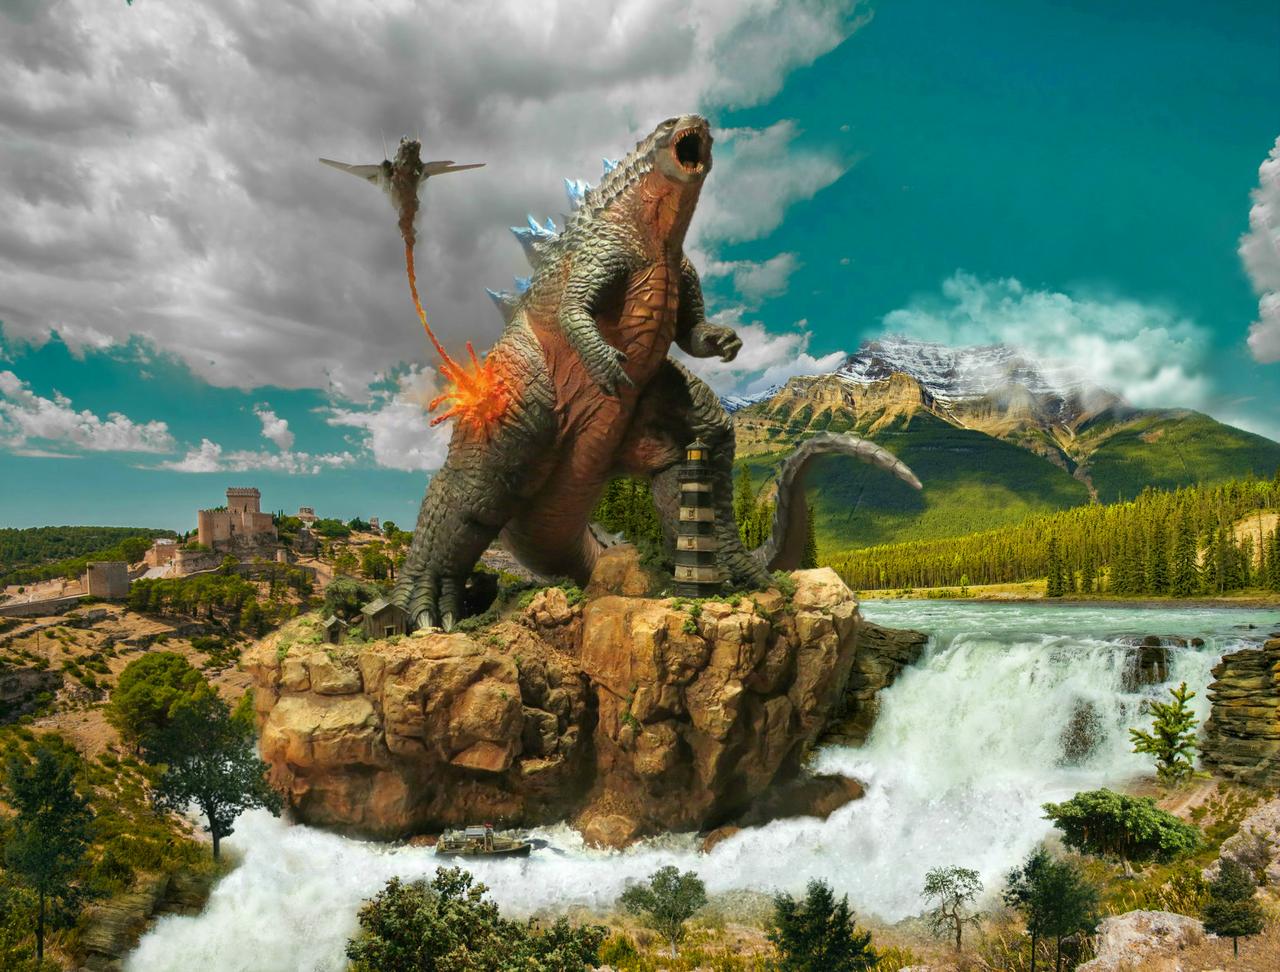 Godzilla 2014 by sarcophagus6